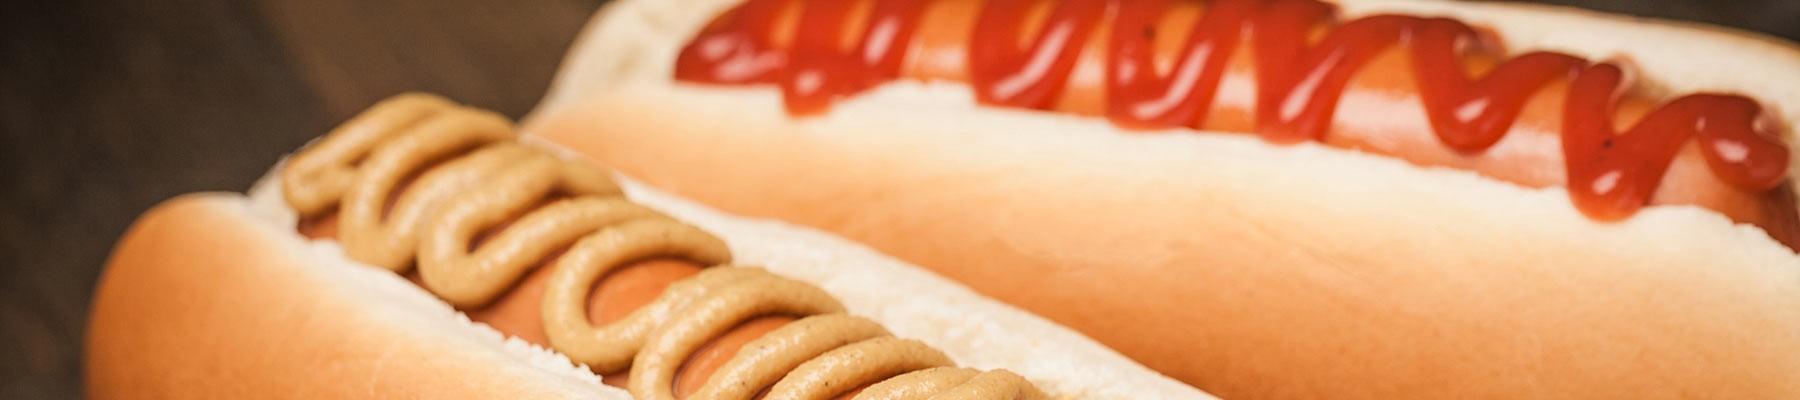 Hotdogworld, votre partenaire Hot Dog